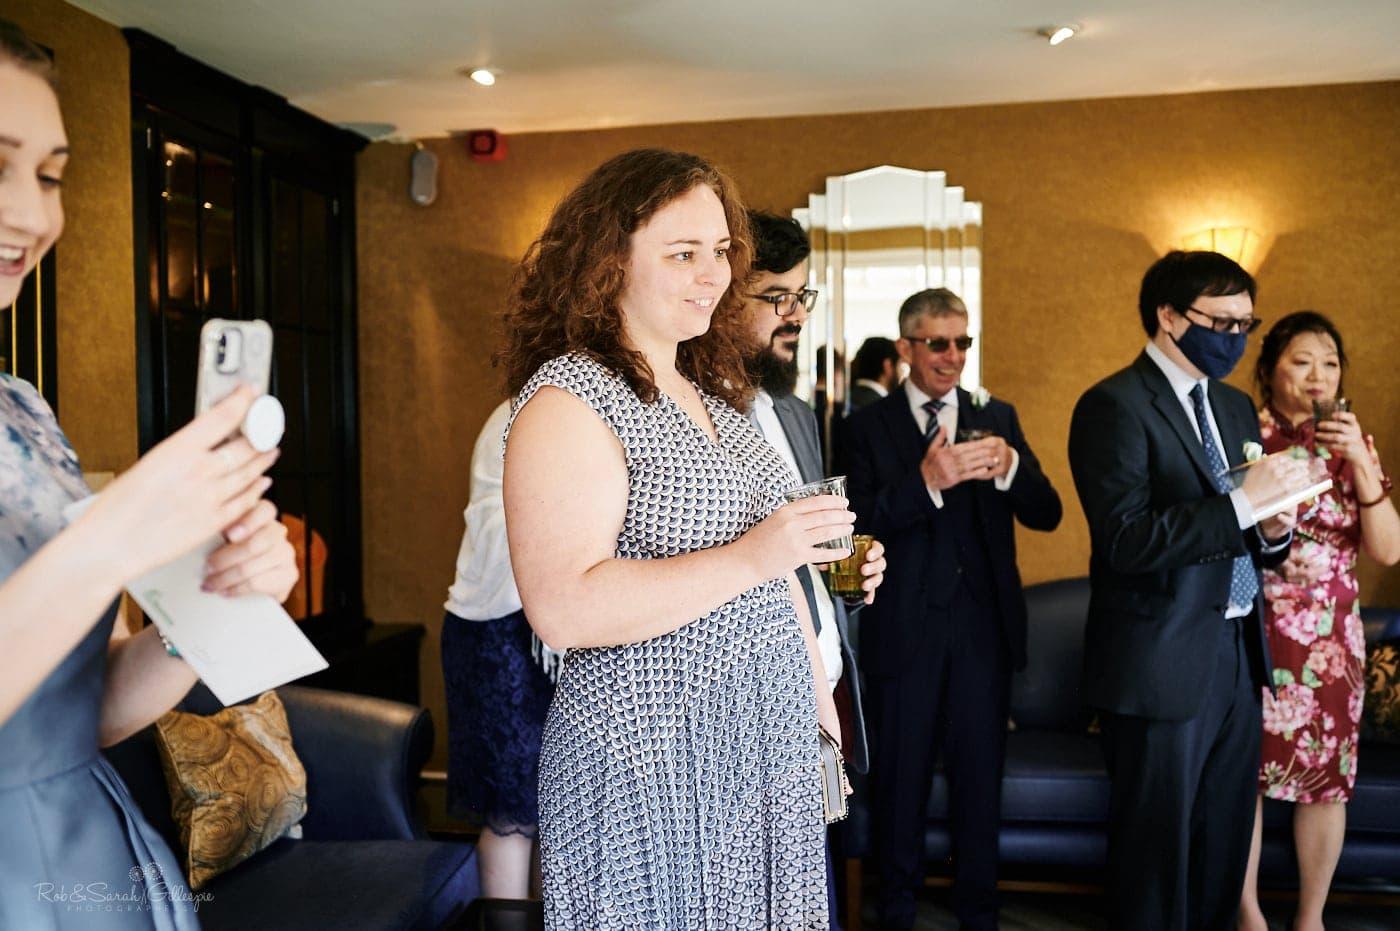 Wedding guests watch bride and groom cut cake